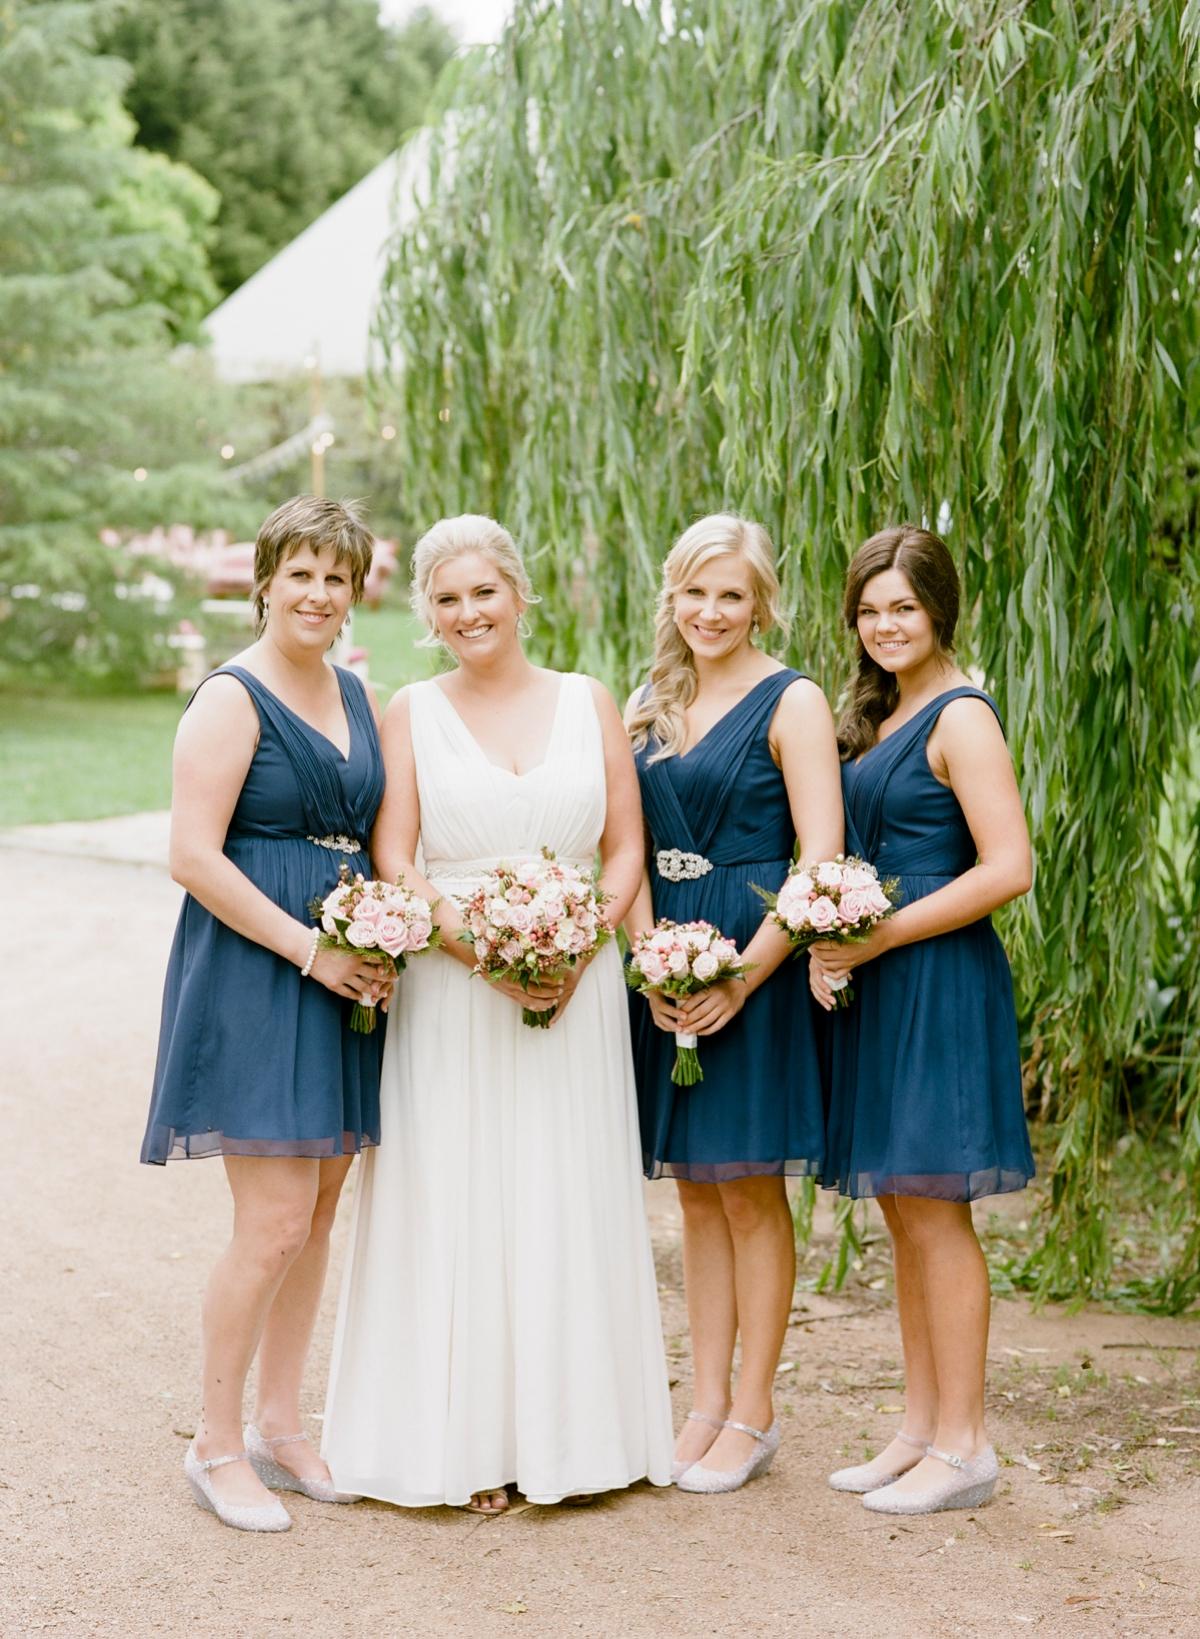 Monterose berry farm wedding by Mr Edwards Photography_0724.jpg